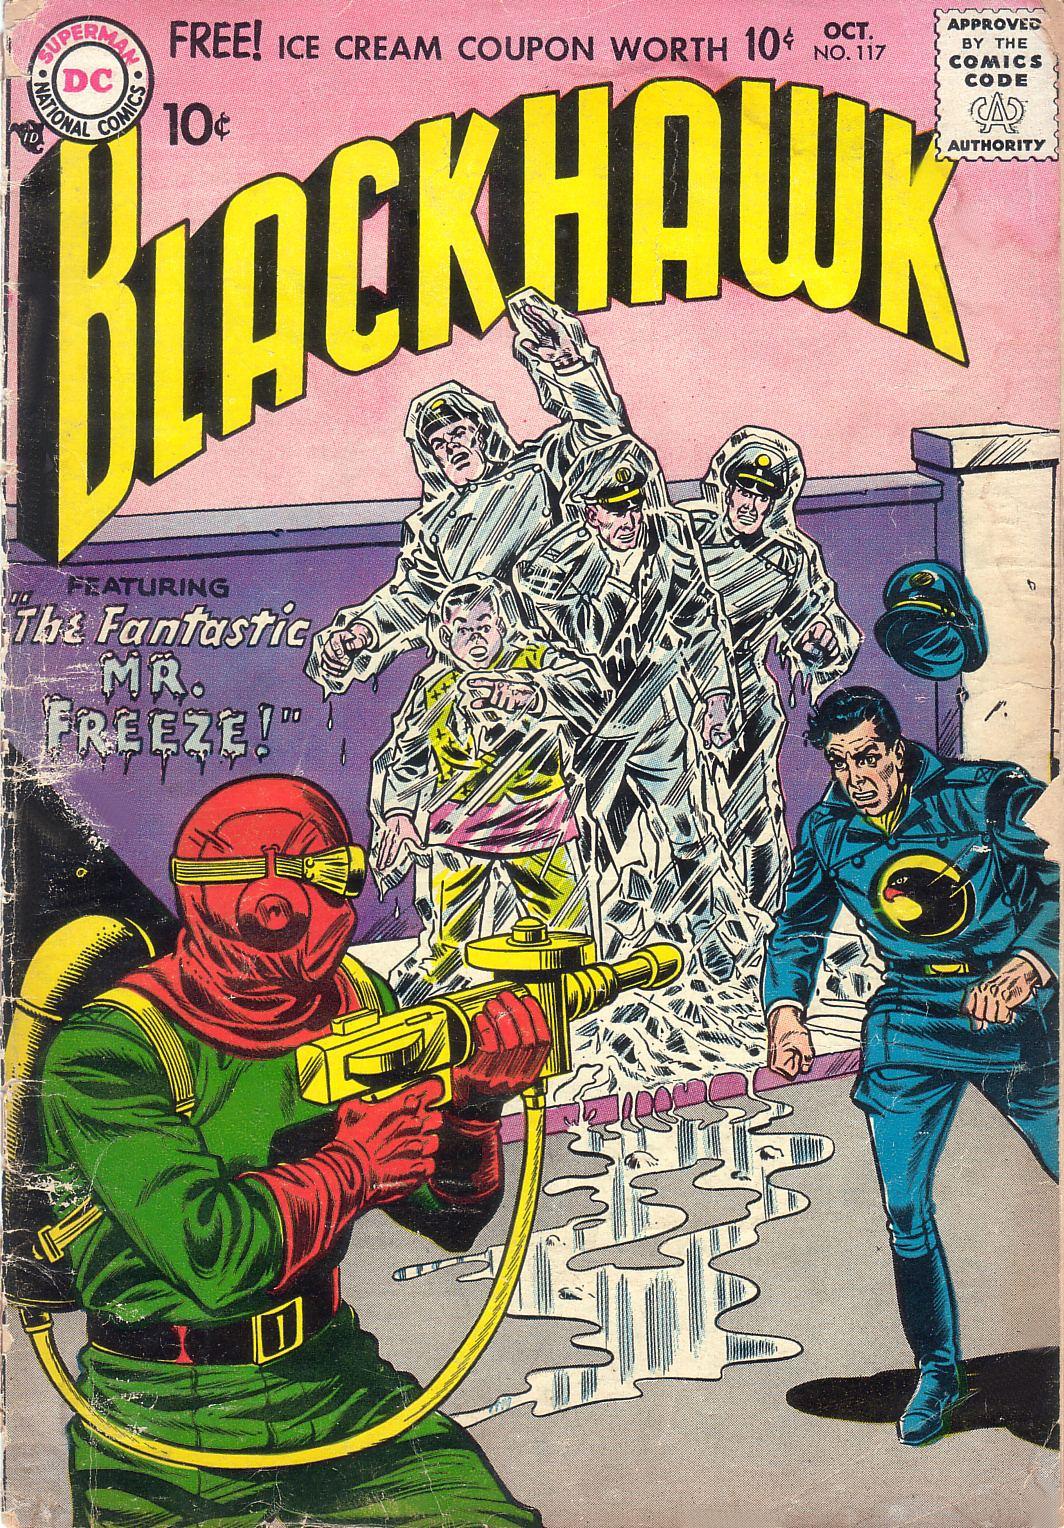 Blackhawk (1957) 117 Page 1